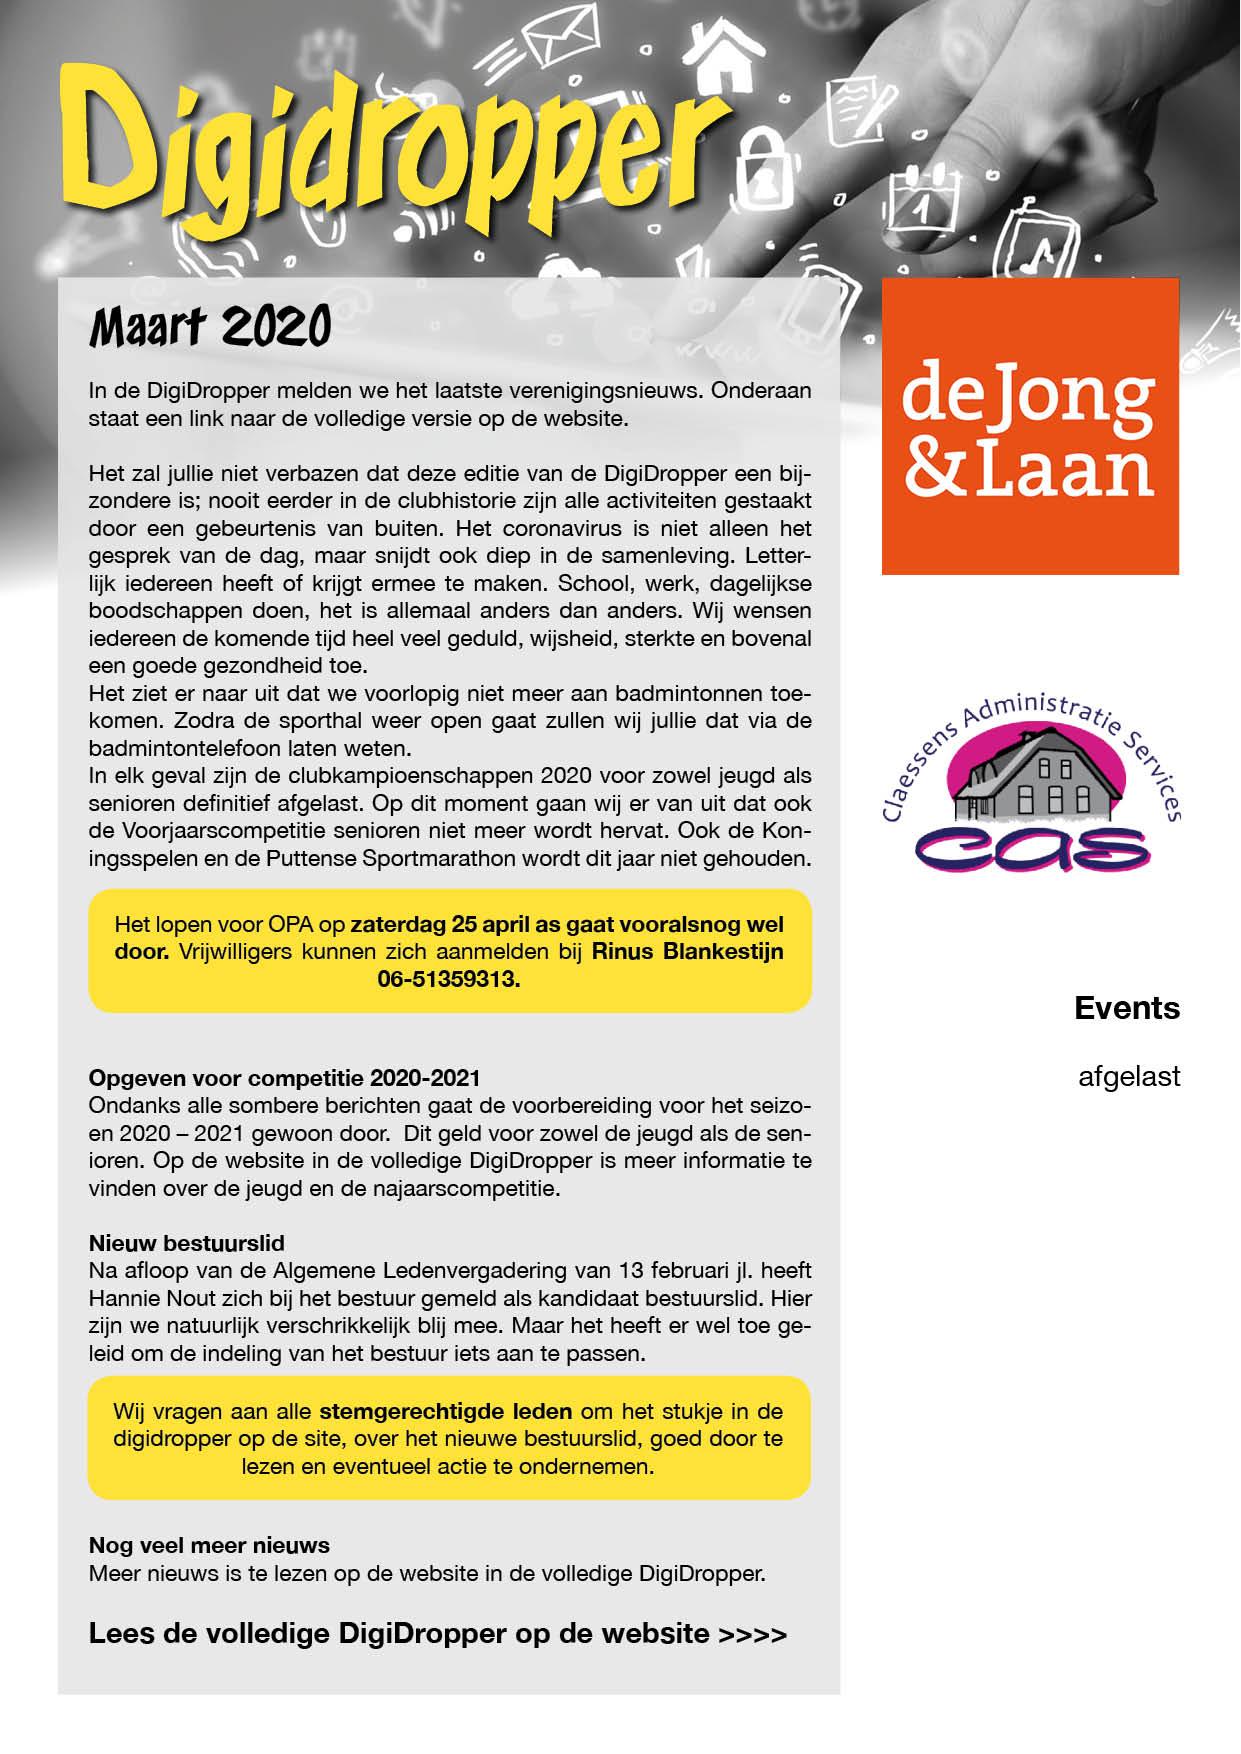 digidropper maart 2020